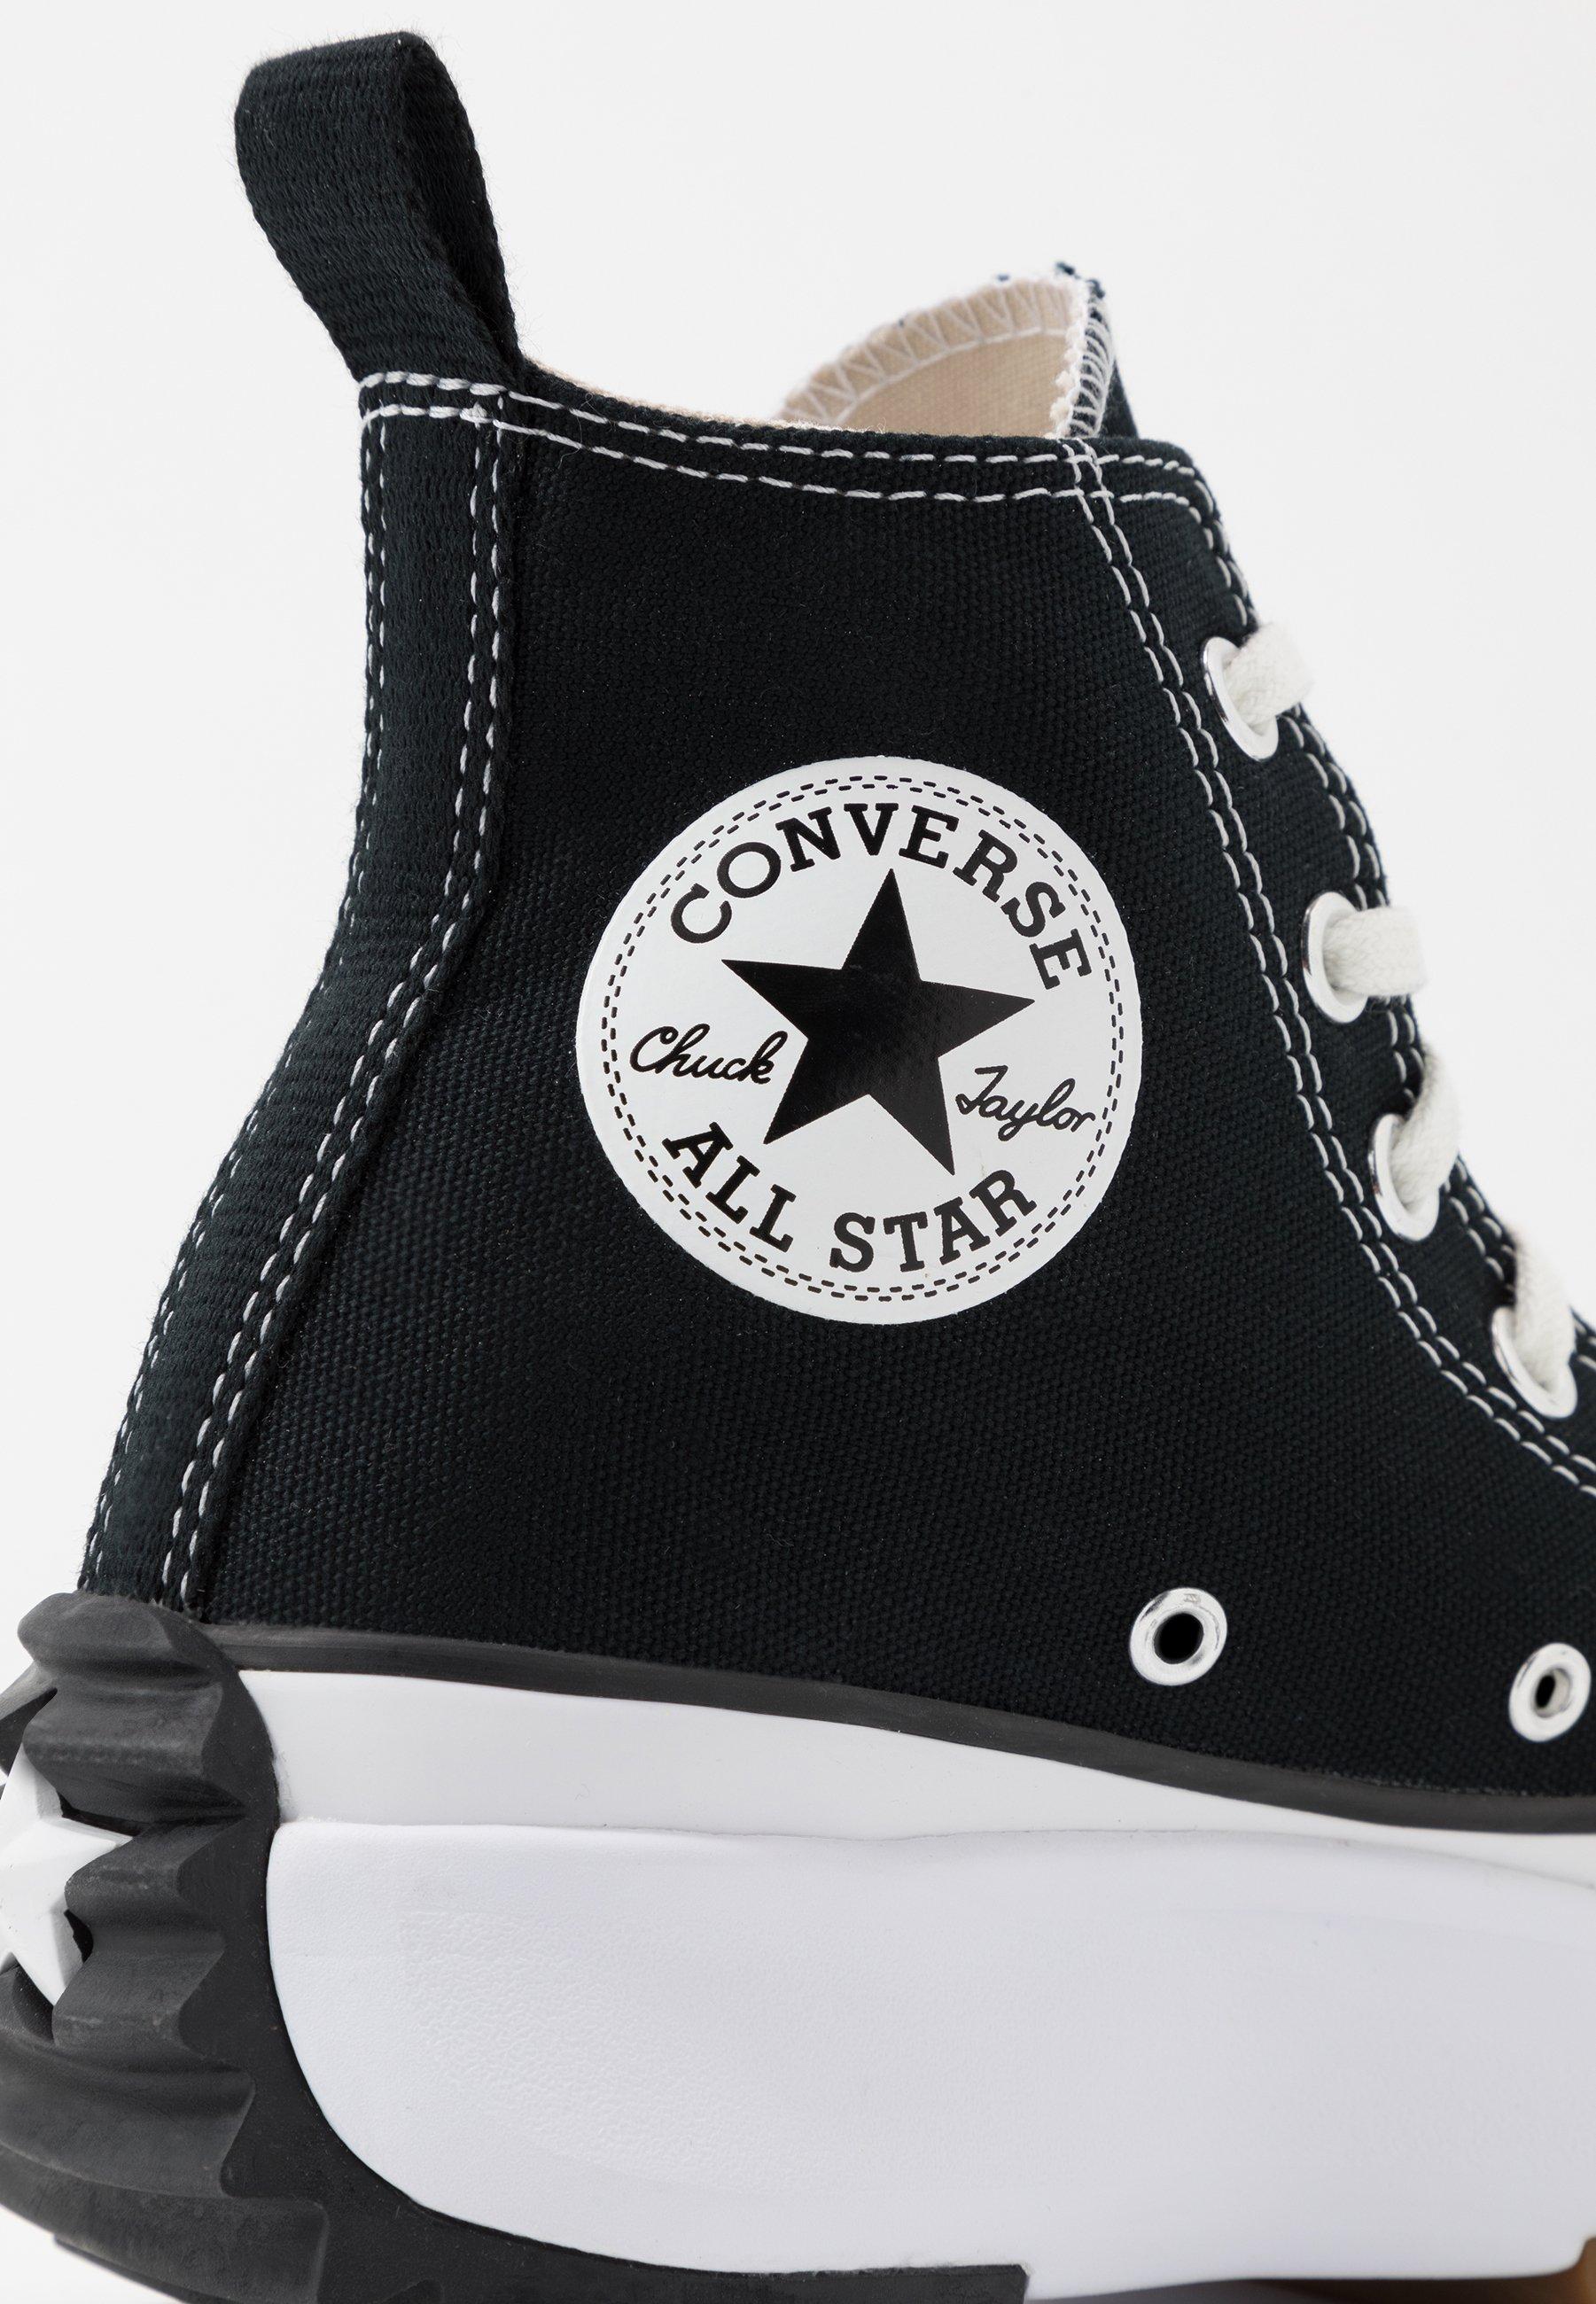 Converse RUN STAR HIKE Sneaker high black/white/gum/schwarz